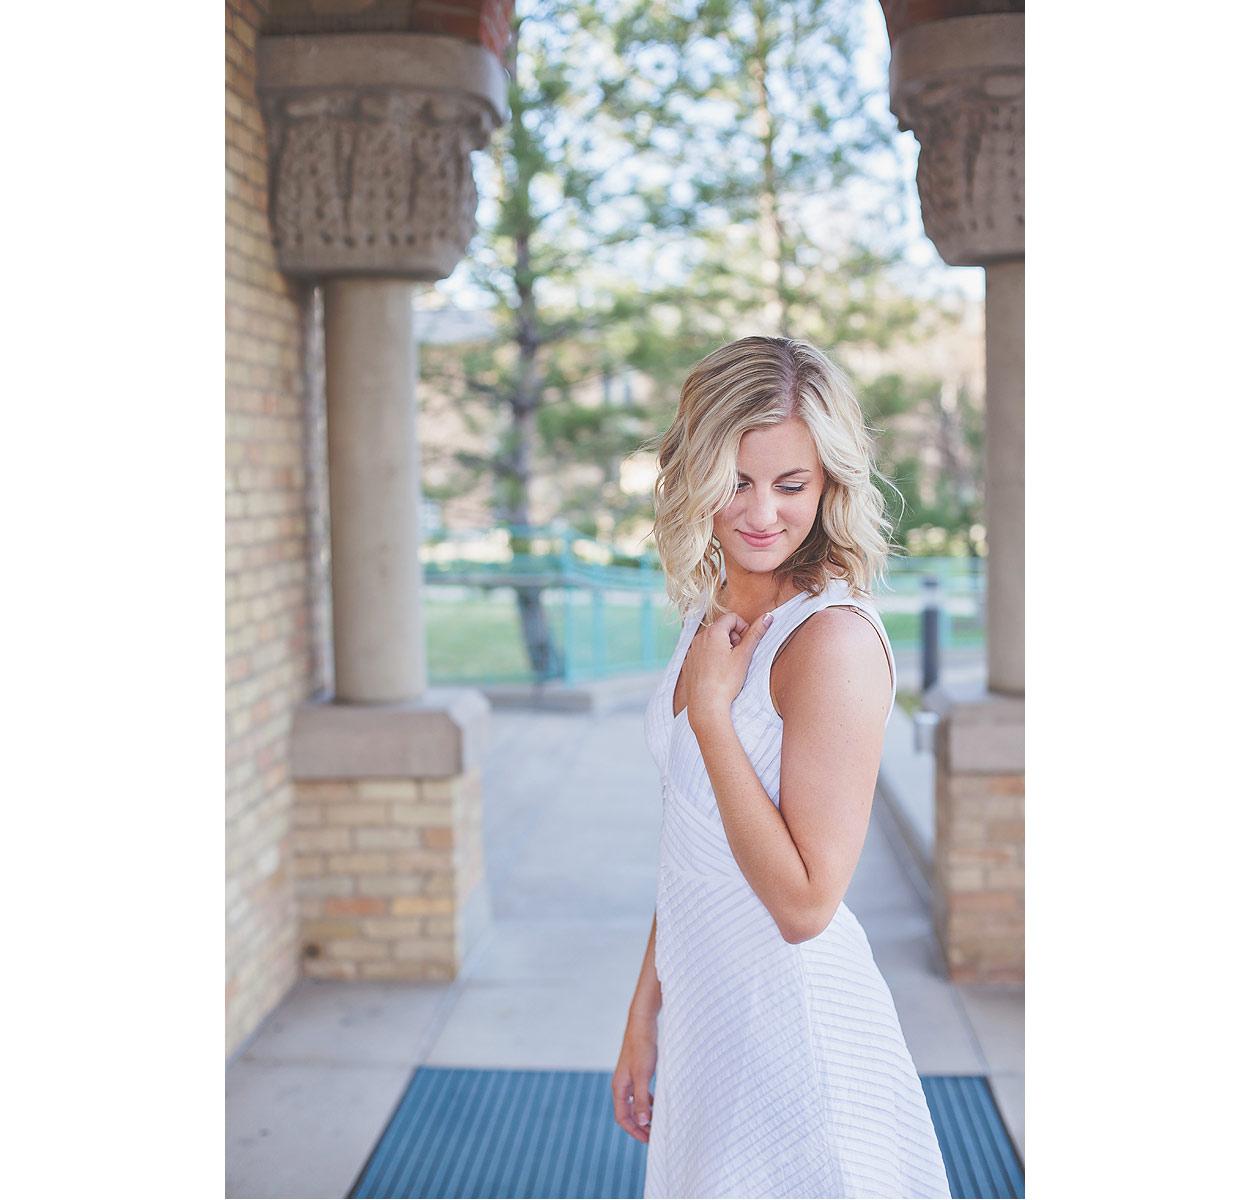 CollegeGraduationPortraits-HeidiRandallStudios-Courtney-14.jpg